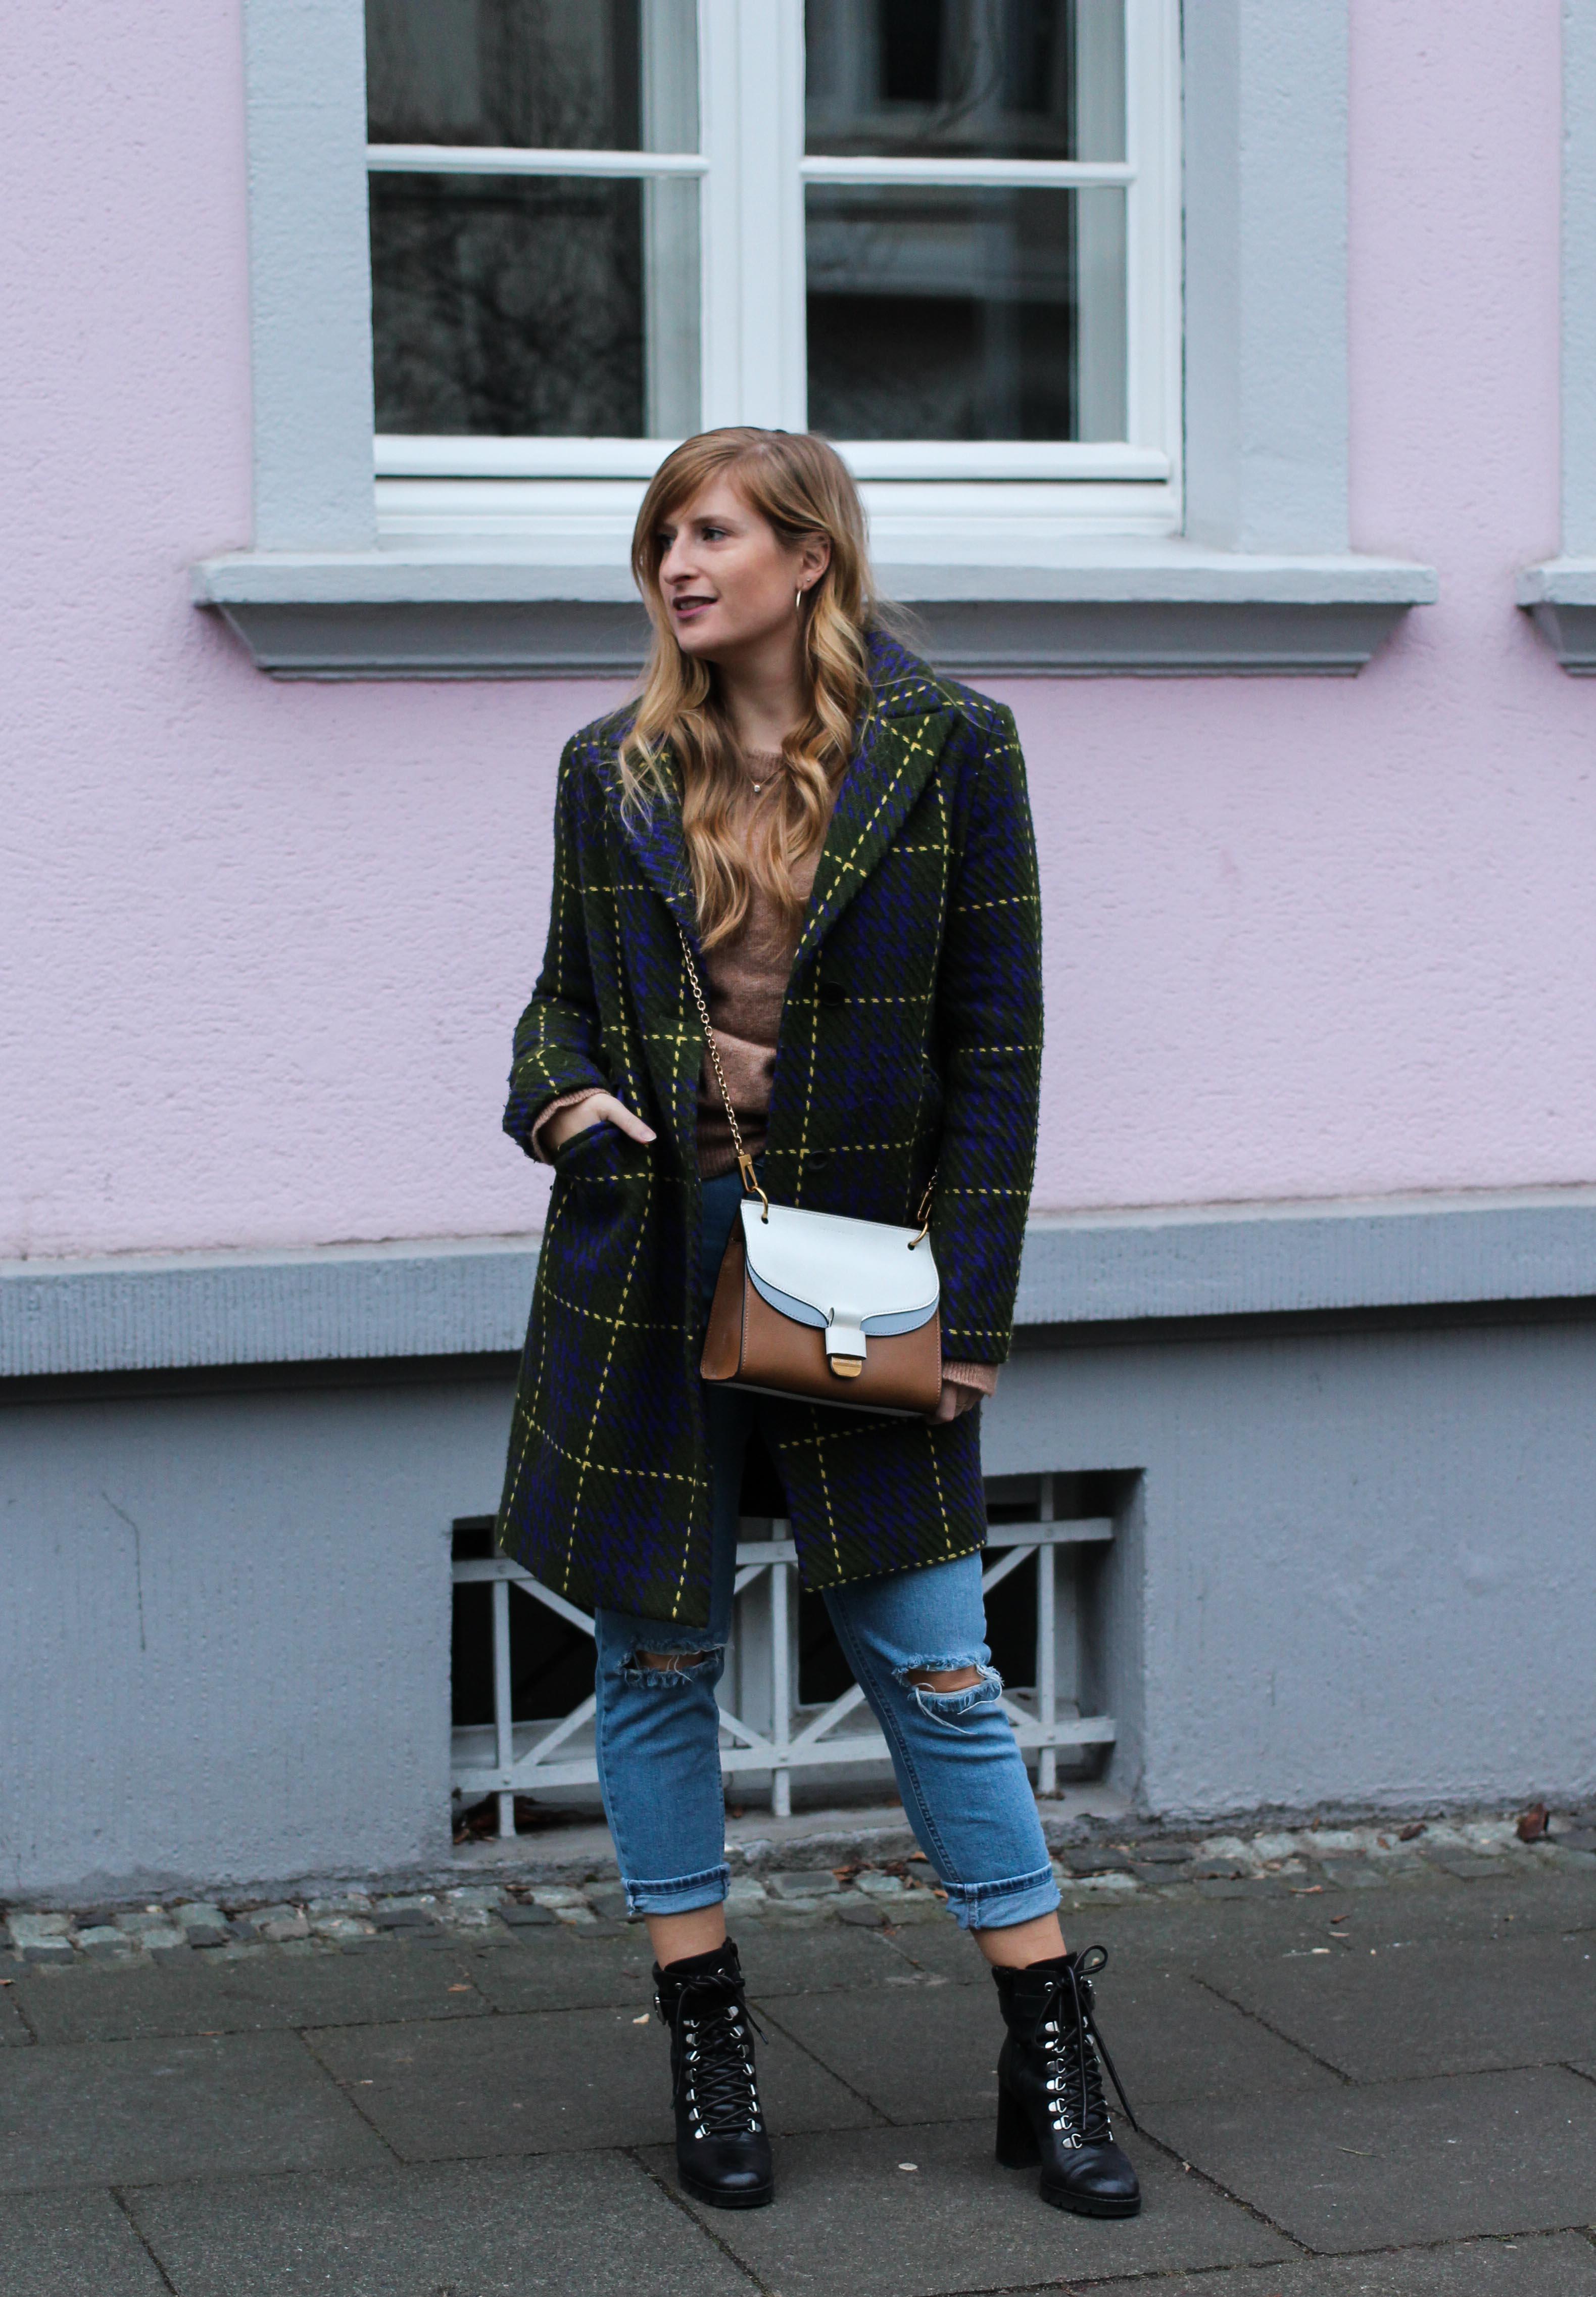 Herbst Must-Have 2019 Karomantel. Herbstmode Herbsttrend Mantel karriert Modeblog Outfit Herbst Fashion Blog Bonn 1